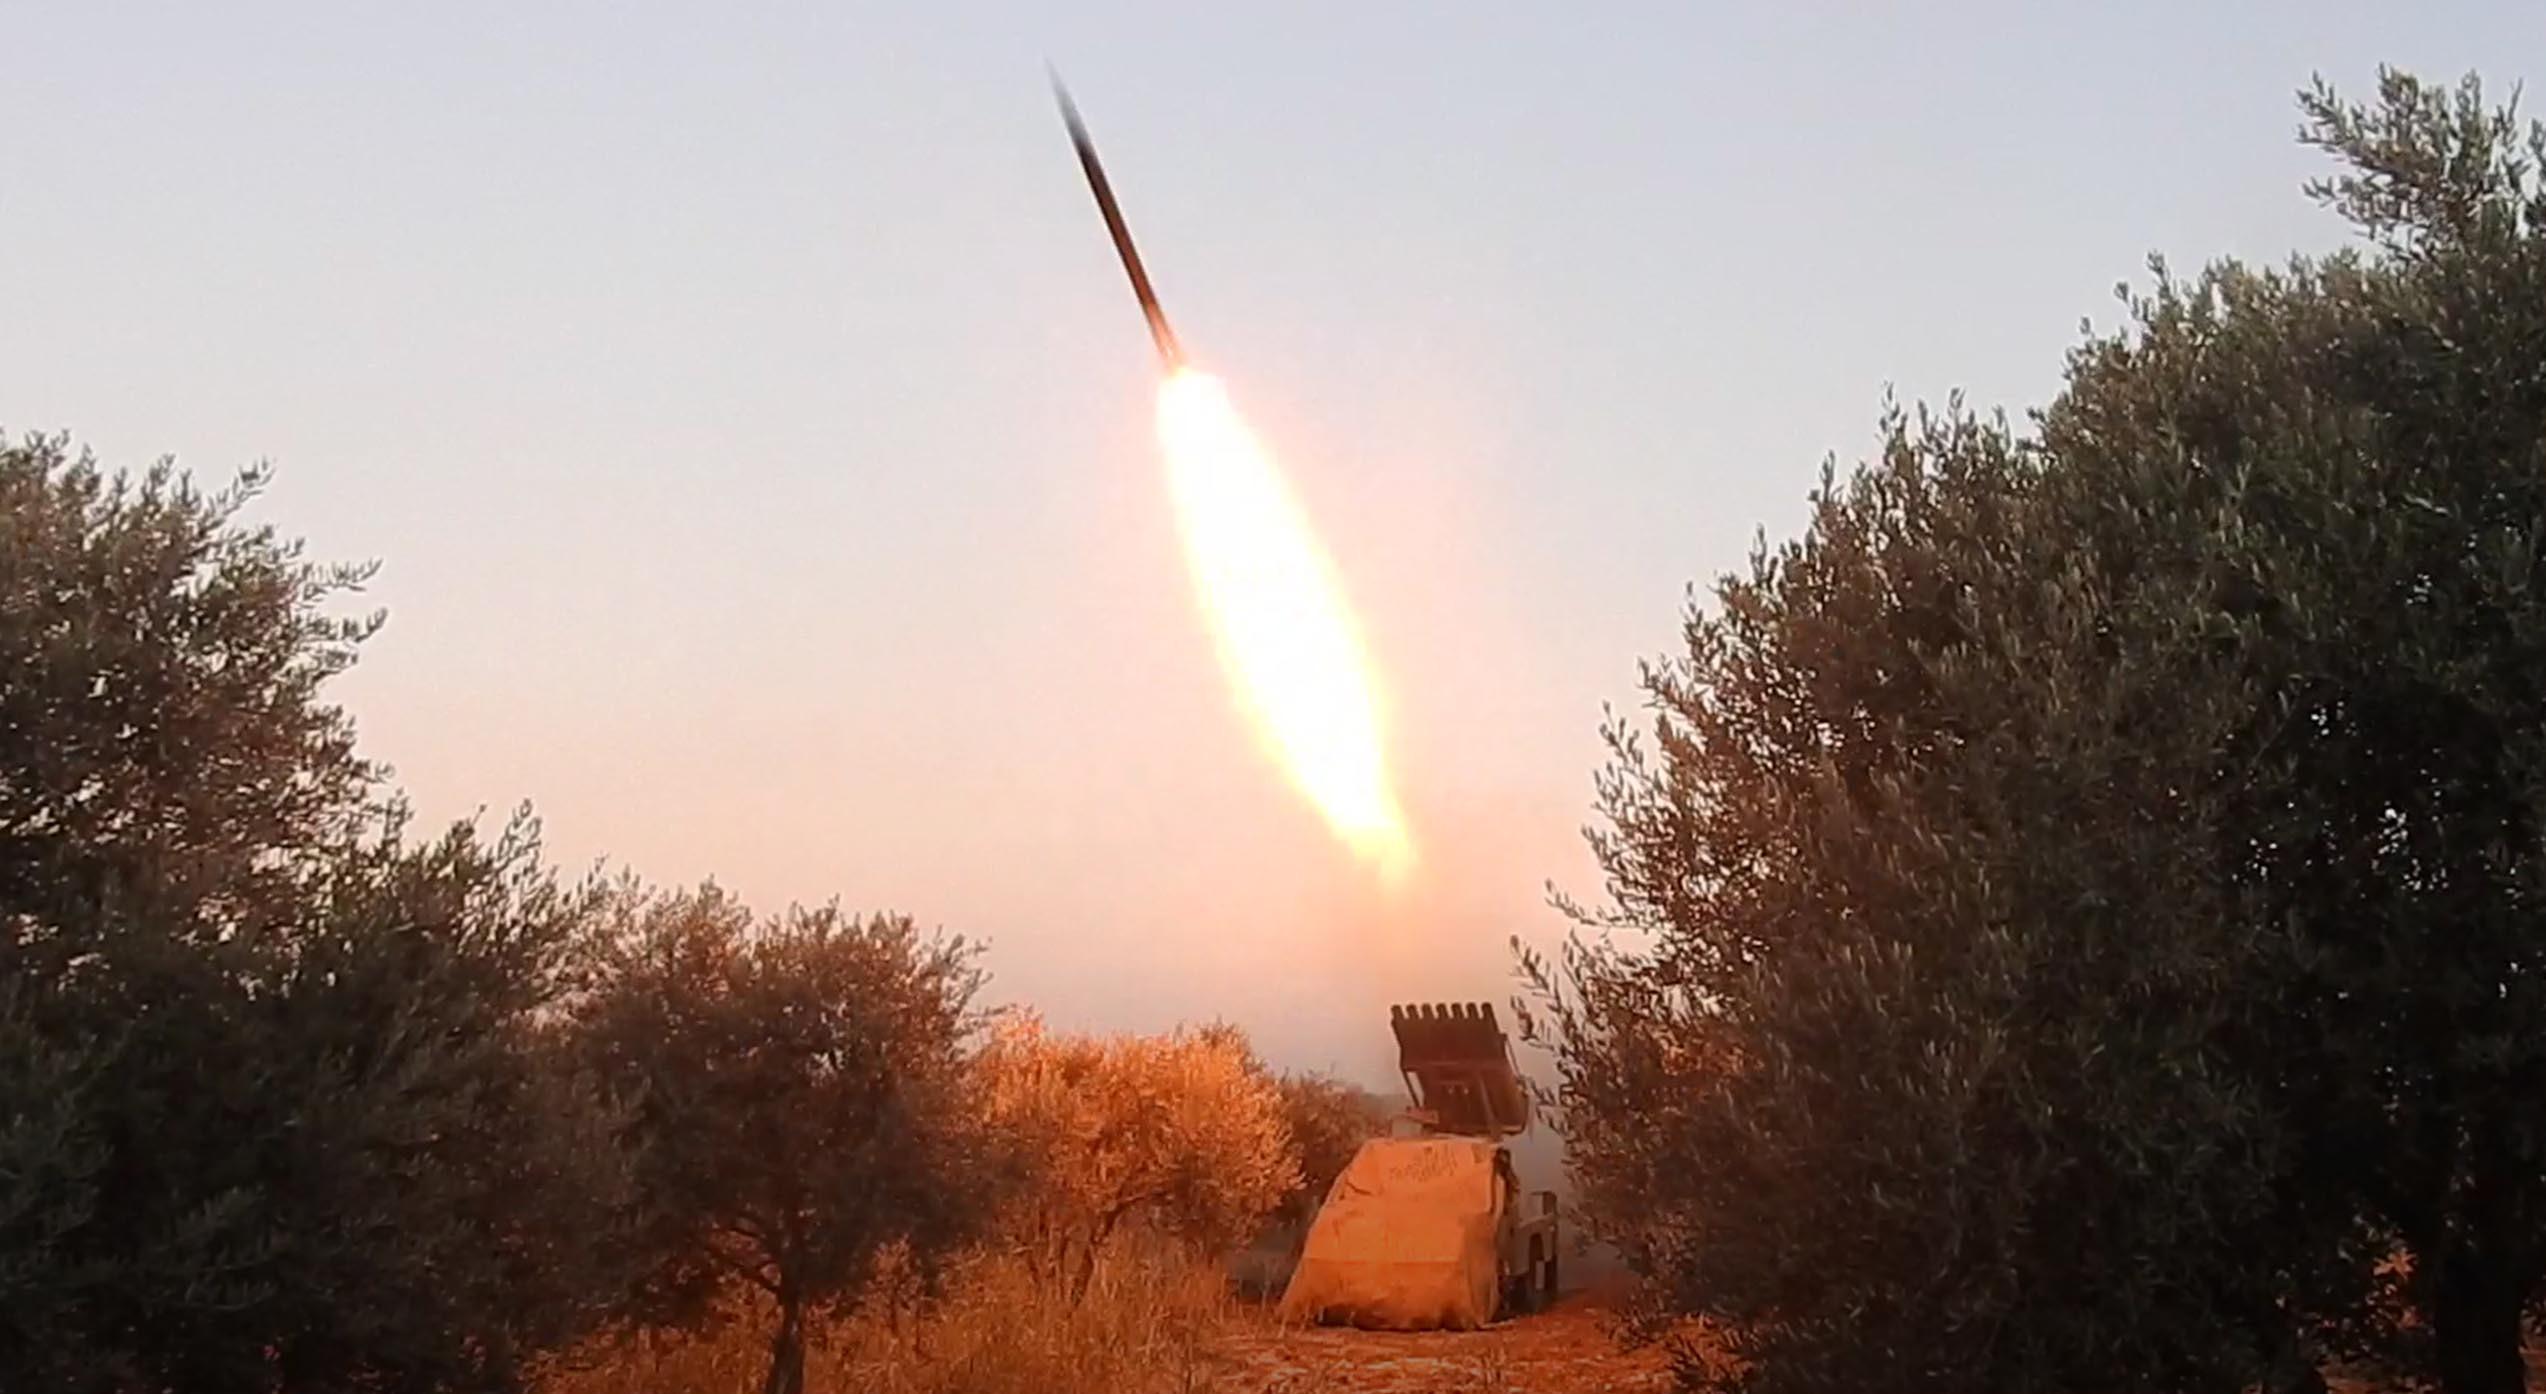 16 Killed In Rocket Attack On Turkish-Occupied Afrin, Kurdish Forces Blamed (Videos, Photos)